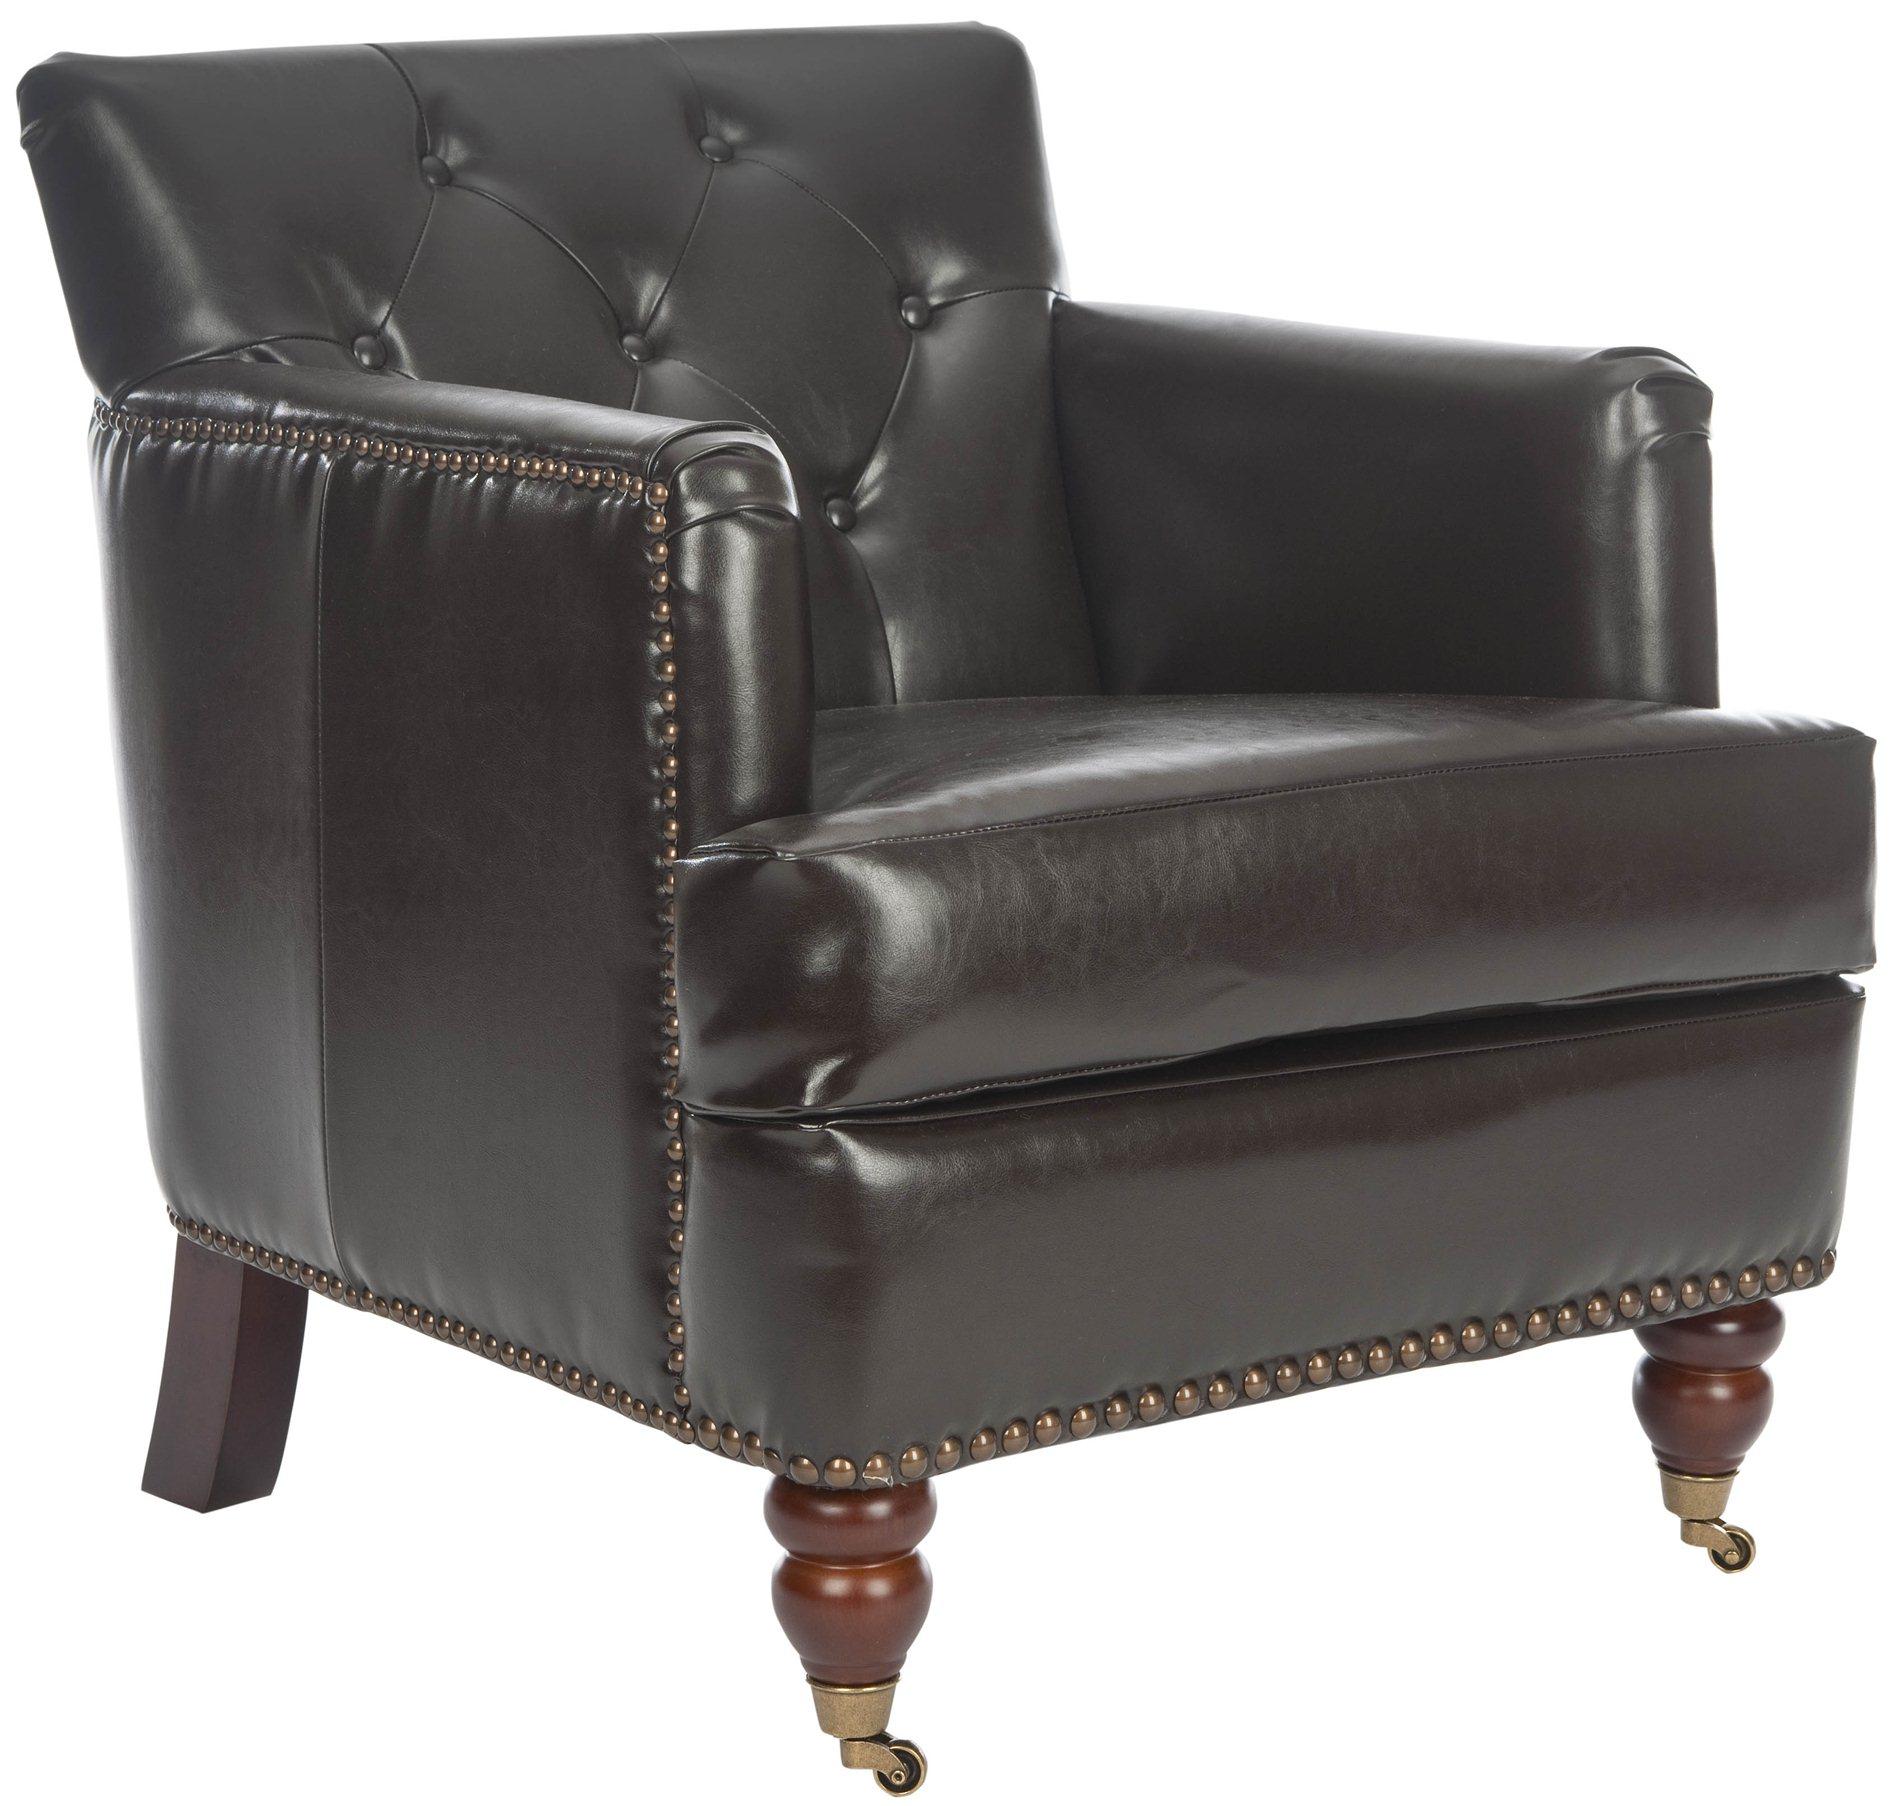 safavieh hud8212c colin leather tufted club chair sfv hud8212c. Black Bedroom Furniture Sets. Home Design Ideas